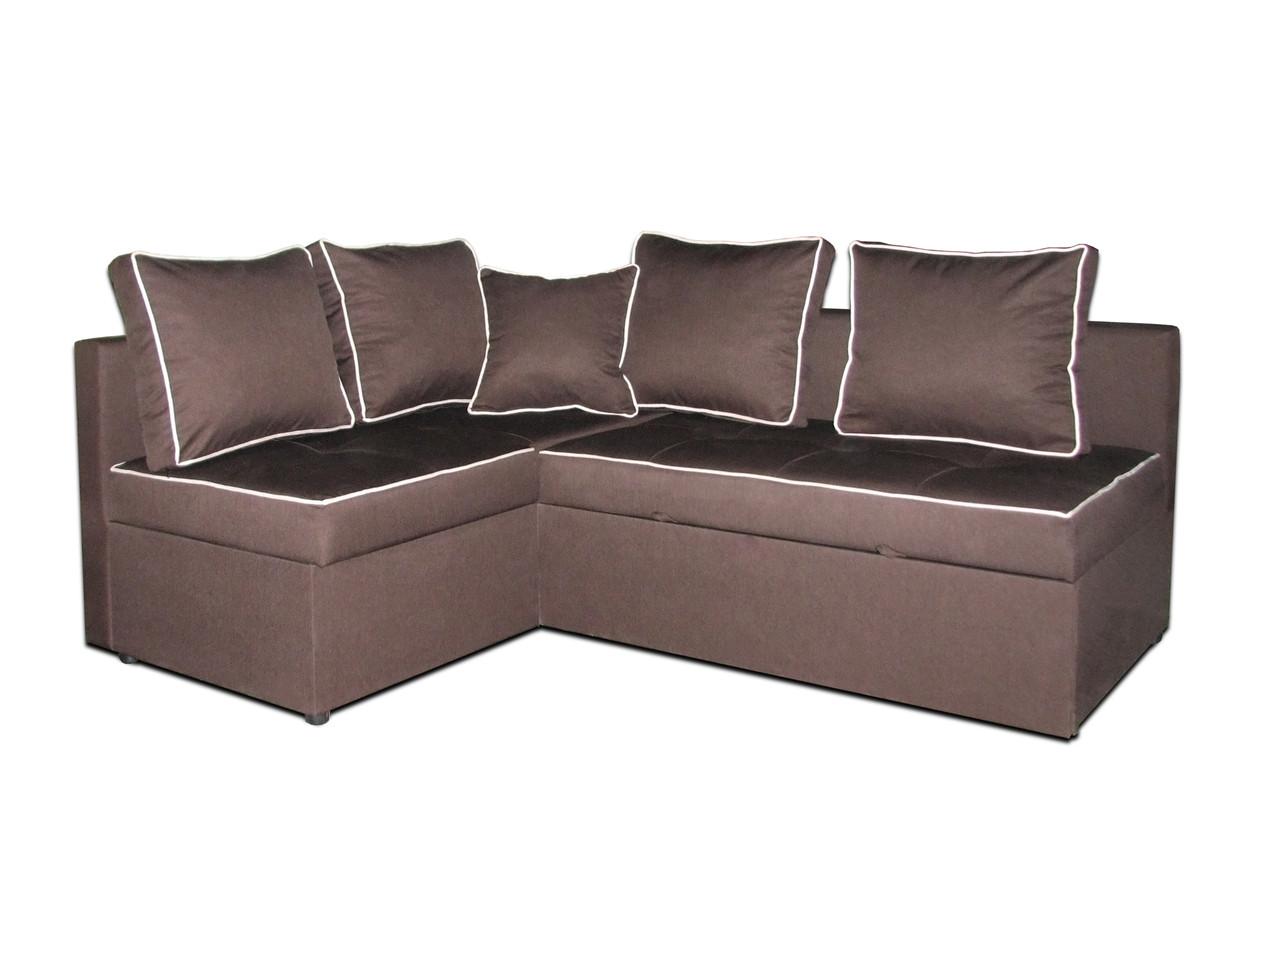 Угловой диван на пружинном блоке Премиум